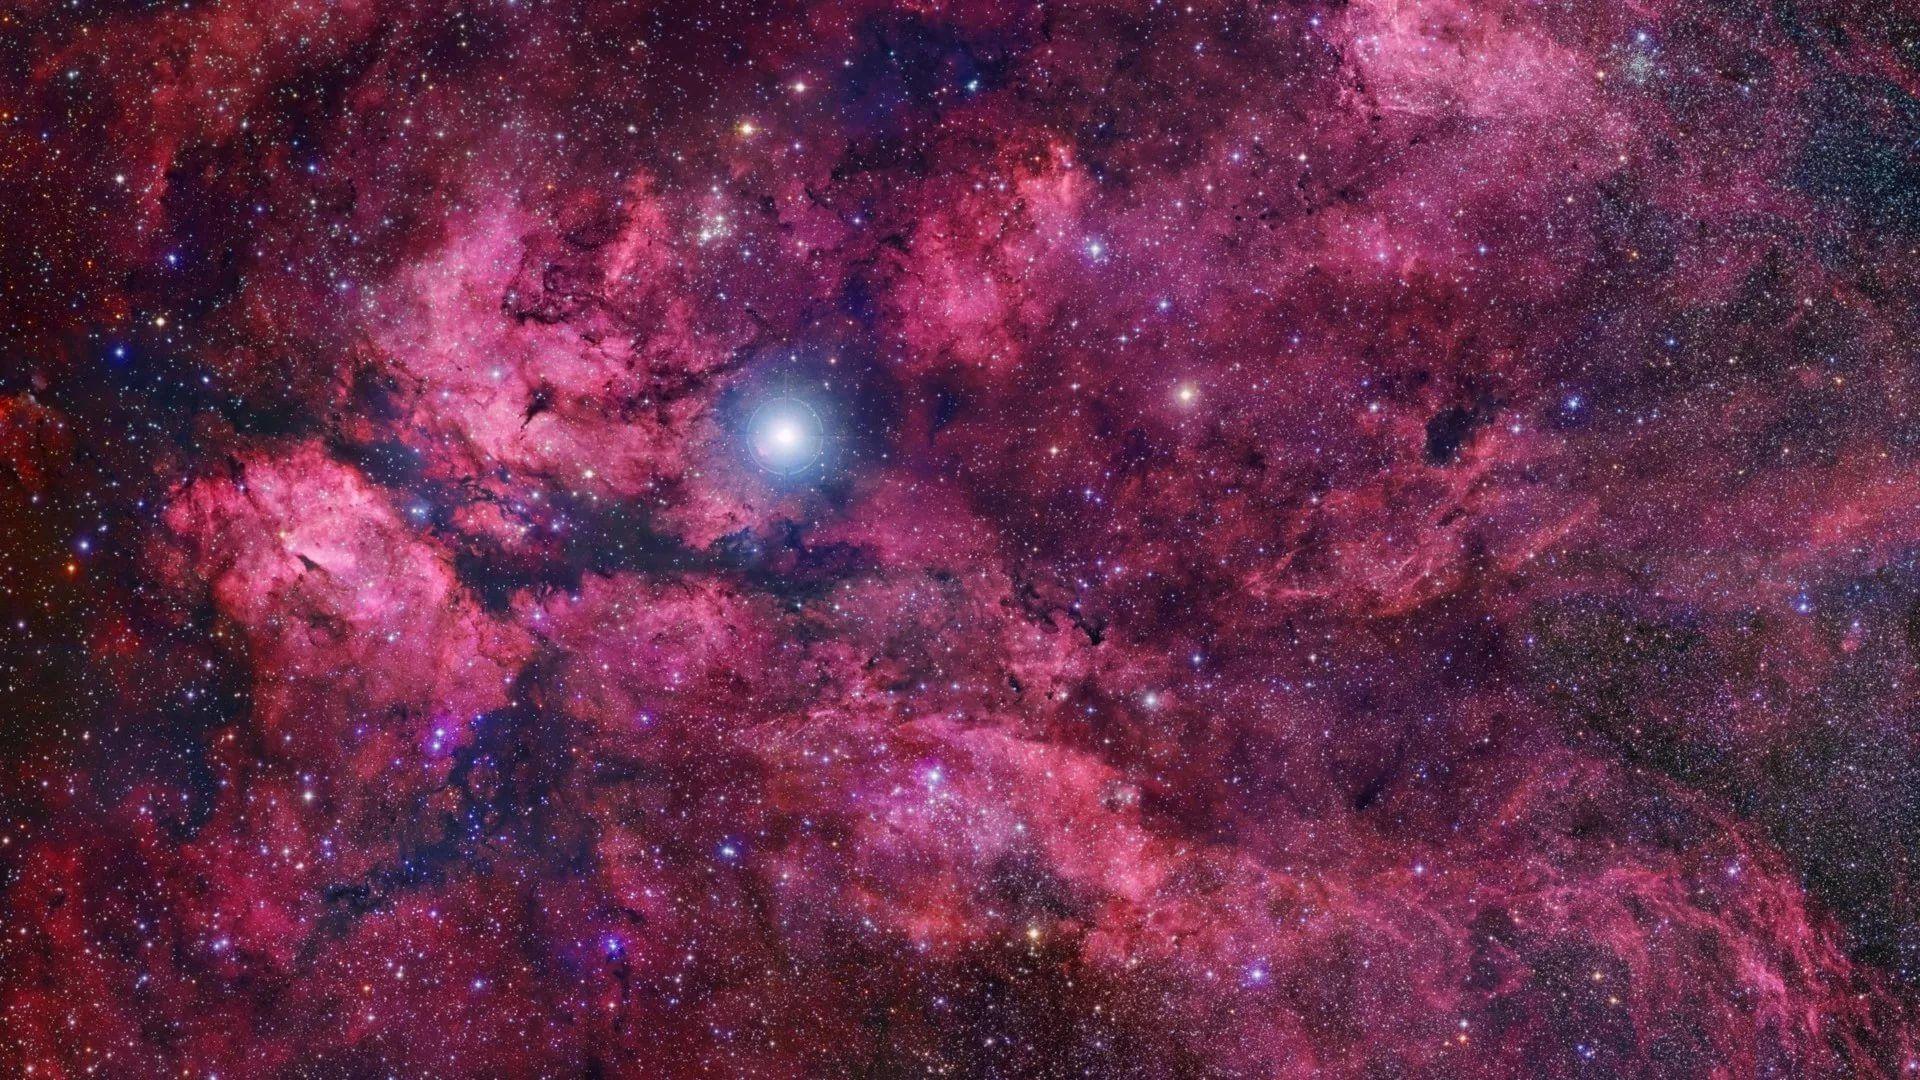 Pink Galaxy hd desktop wallpaper